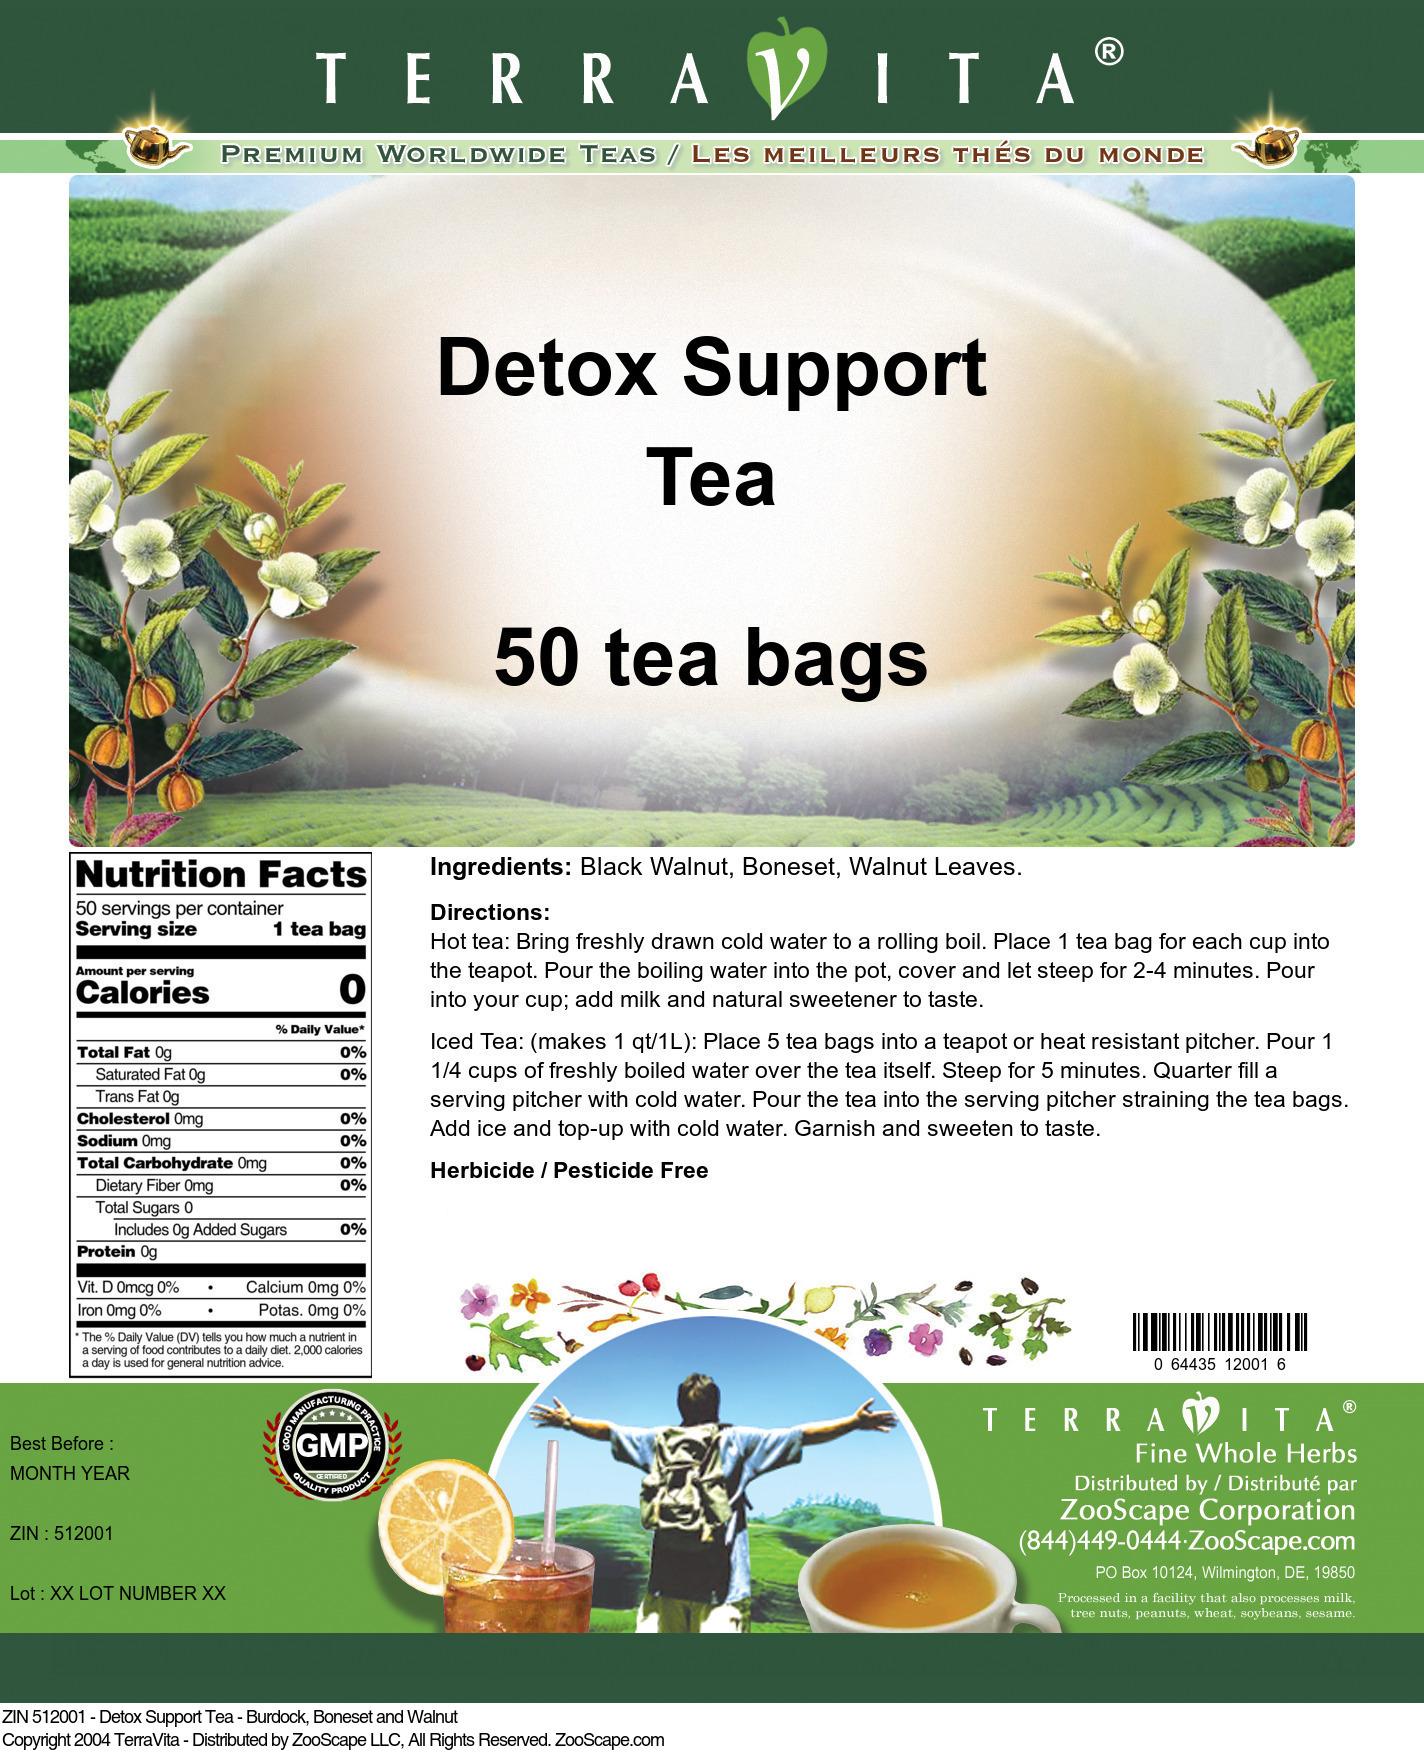 Detox Support Tea - Burdock, Boneset and Walnut